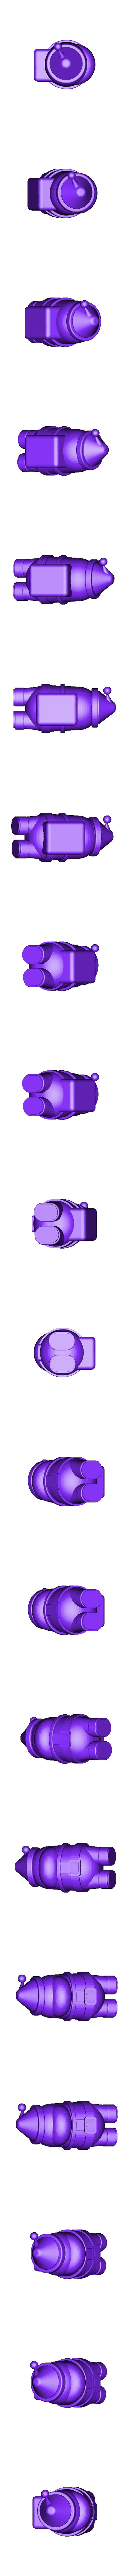 PAPA NOEL.stl Download STL file pack 3 of 10 AMONG US + AMONG EXCLUSIVE MR PRESIDENT • 3D printable design, sebastiancabral719